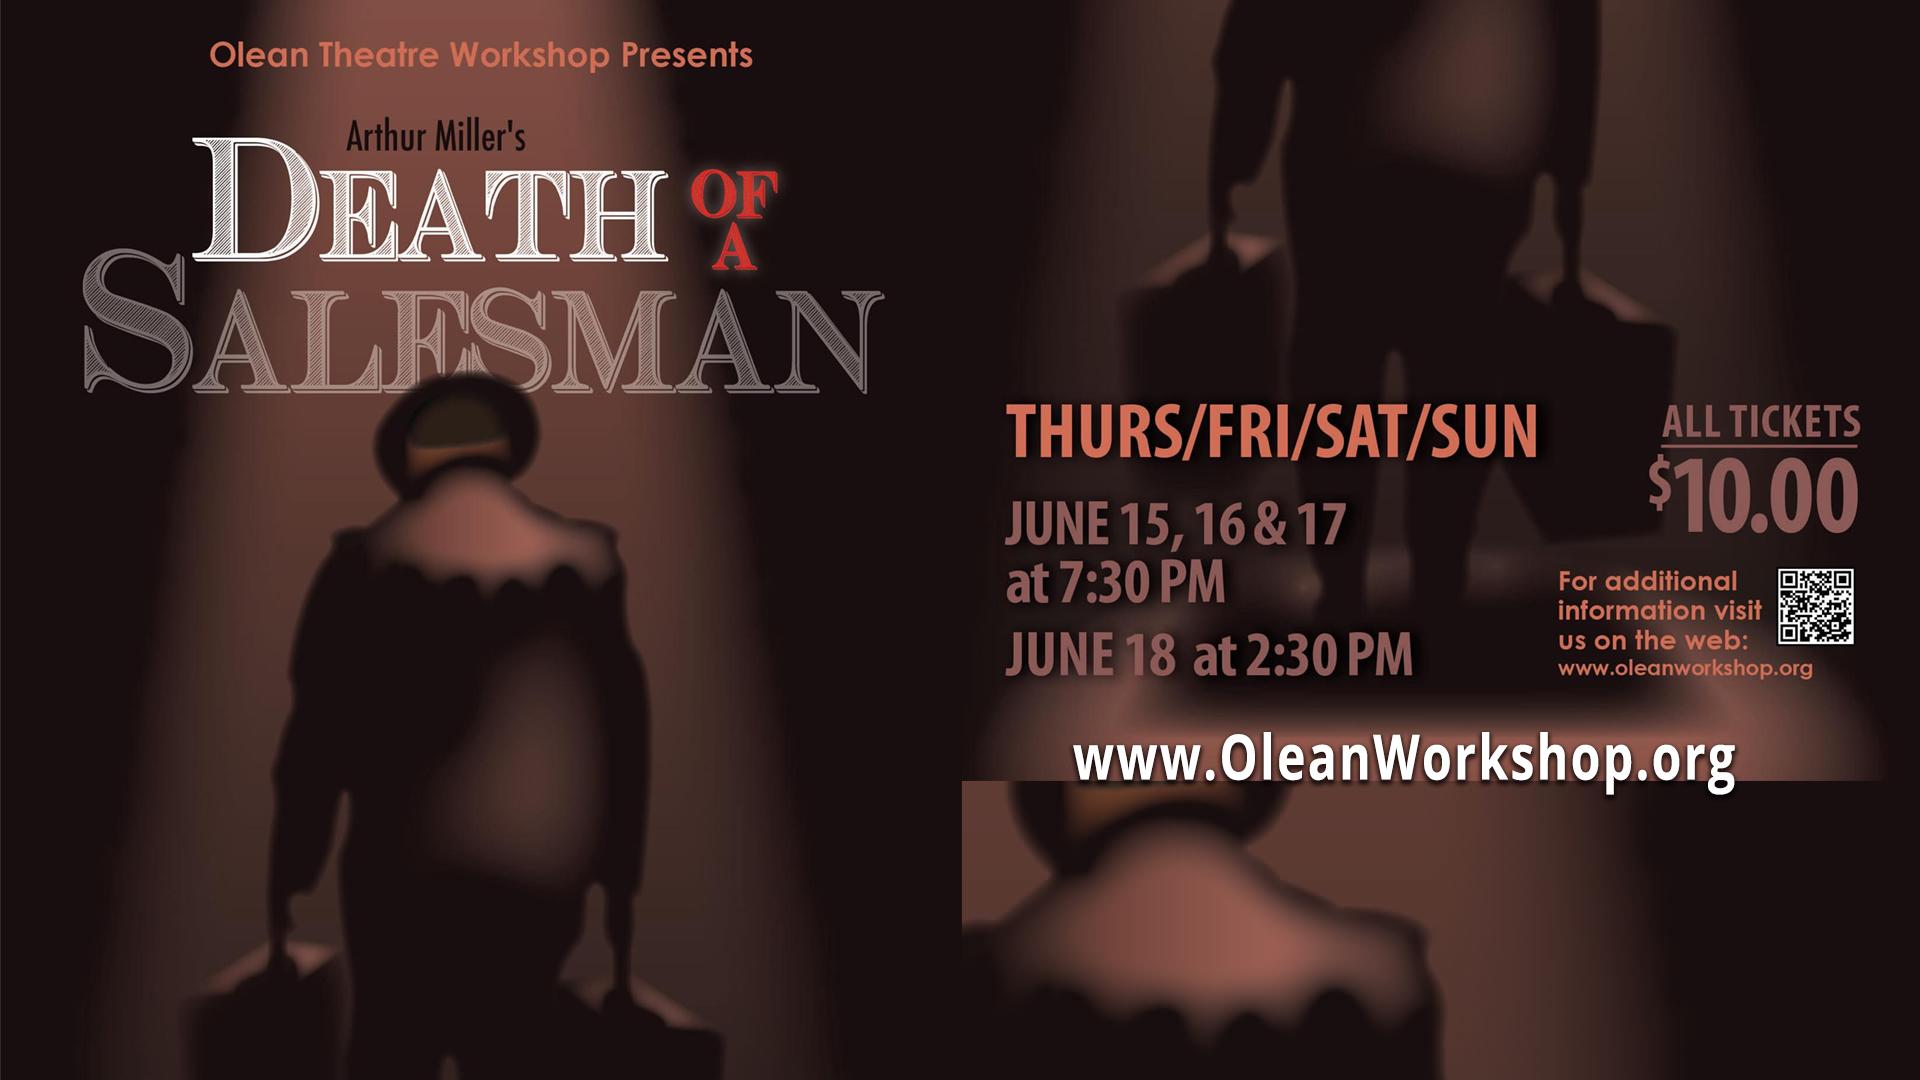 Olean Theatre Workshop presents Death of a Salesman